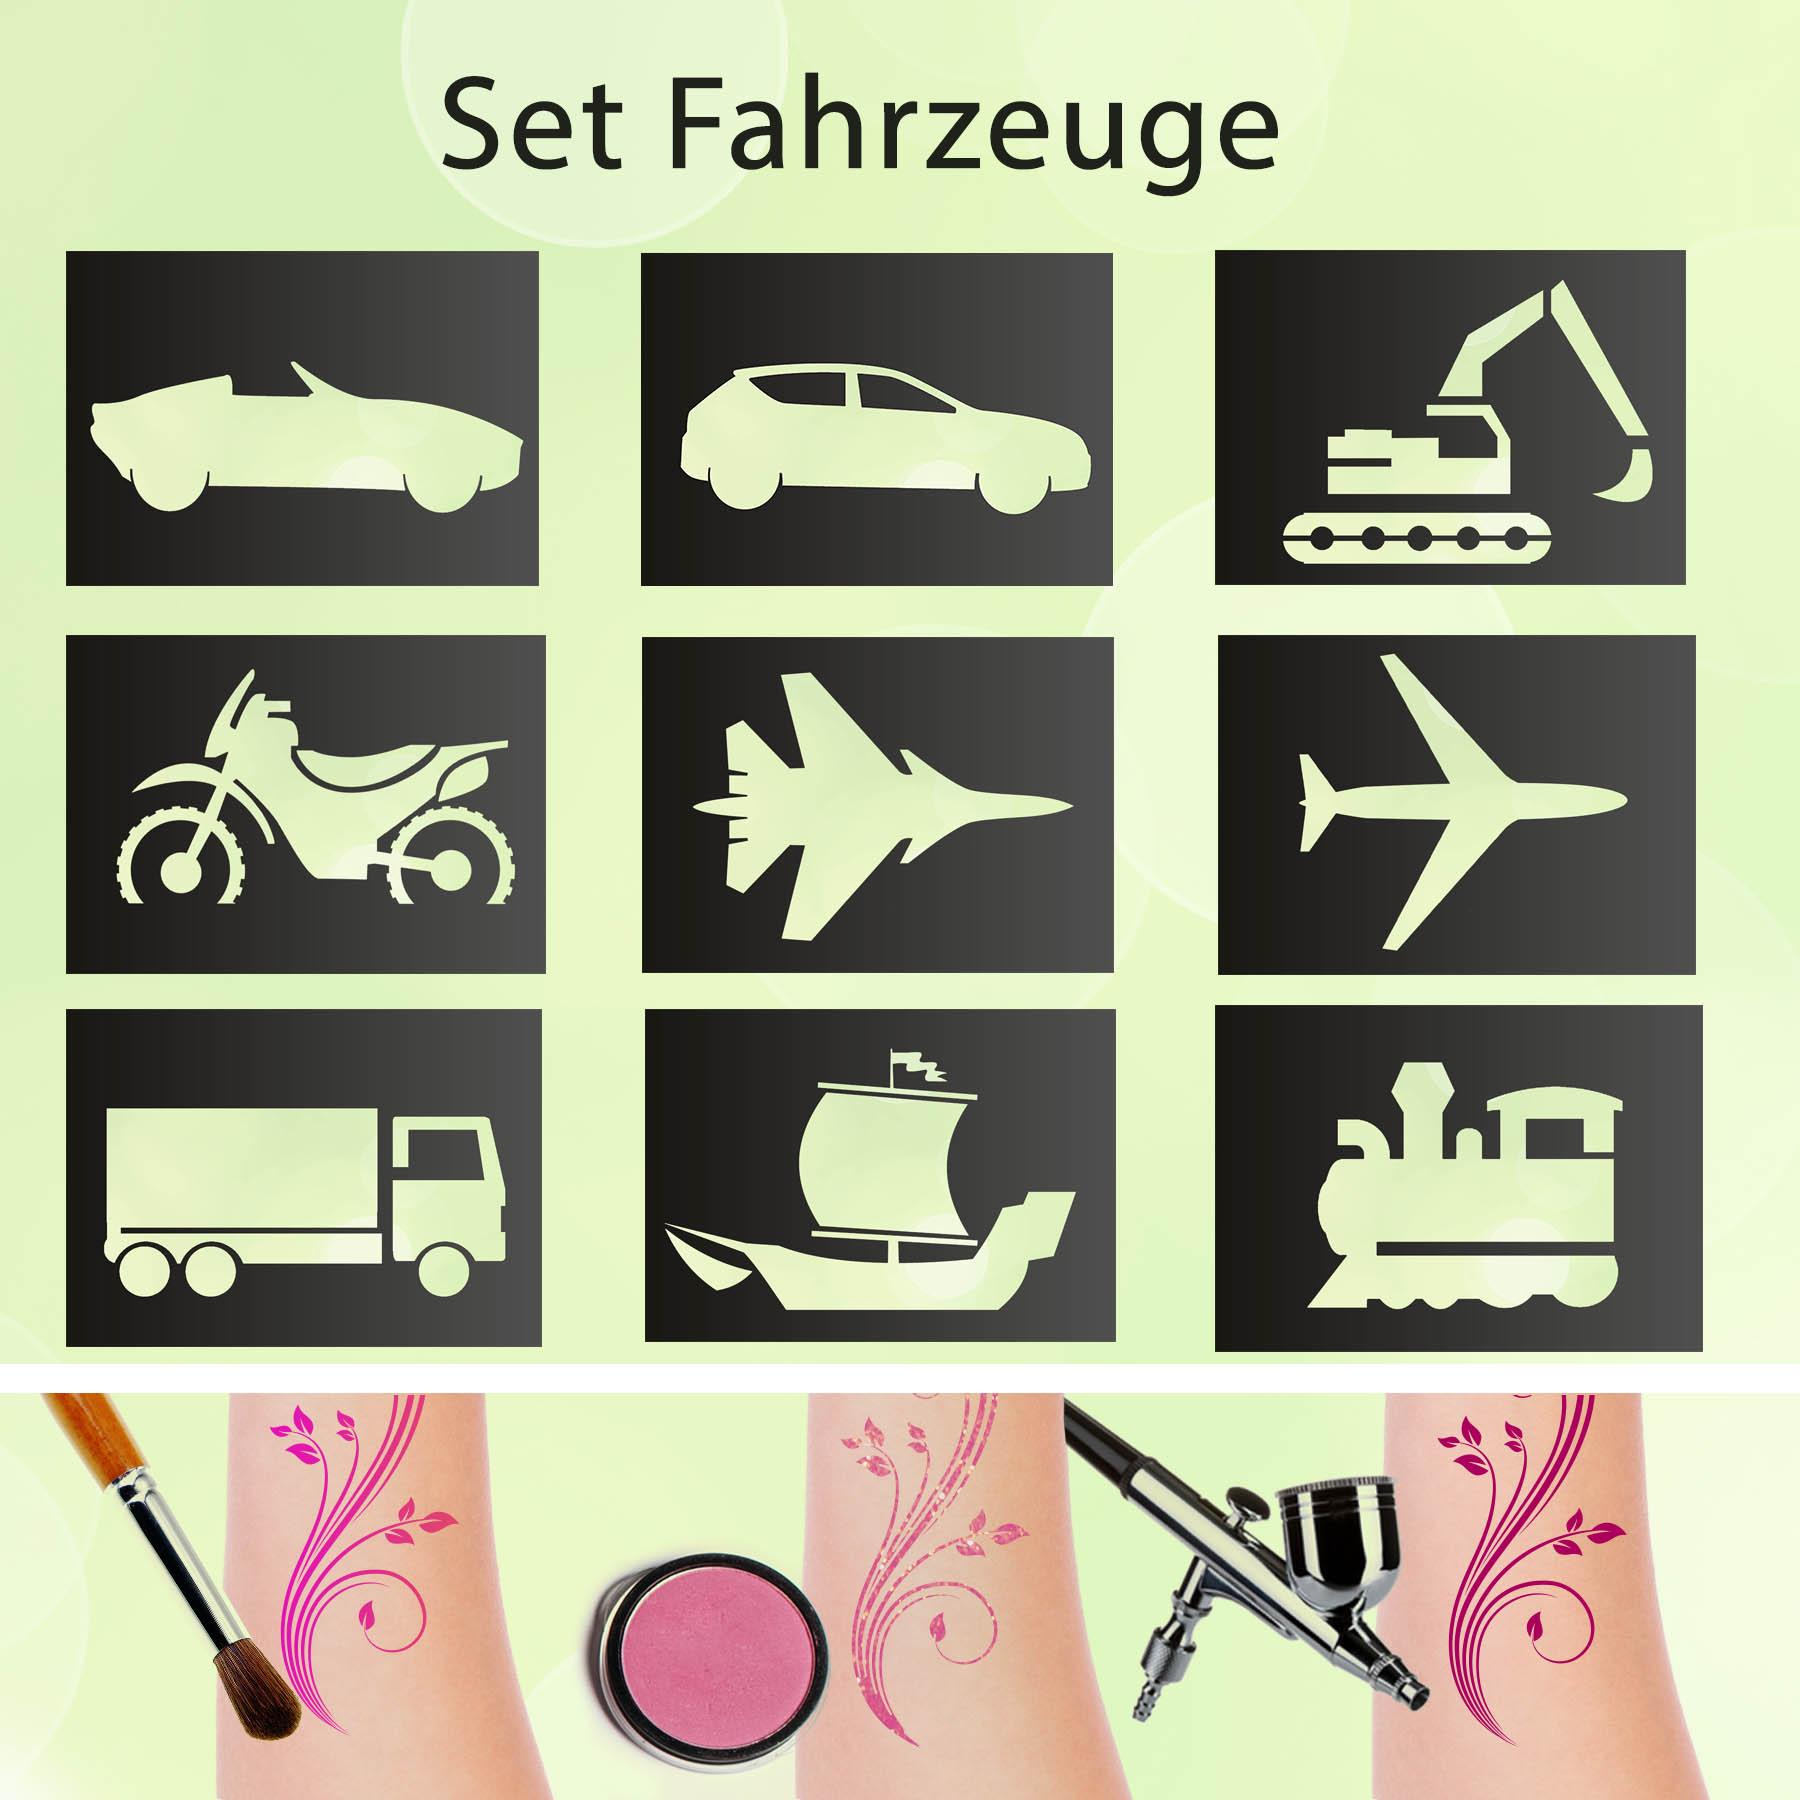 Tattoo Schablonen SET Fahrzeuge (9 Stück) Selbstklebend Kinderschminken Airbrush